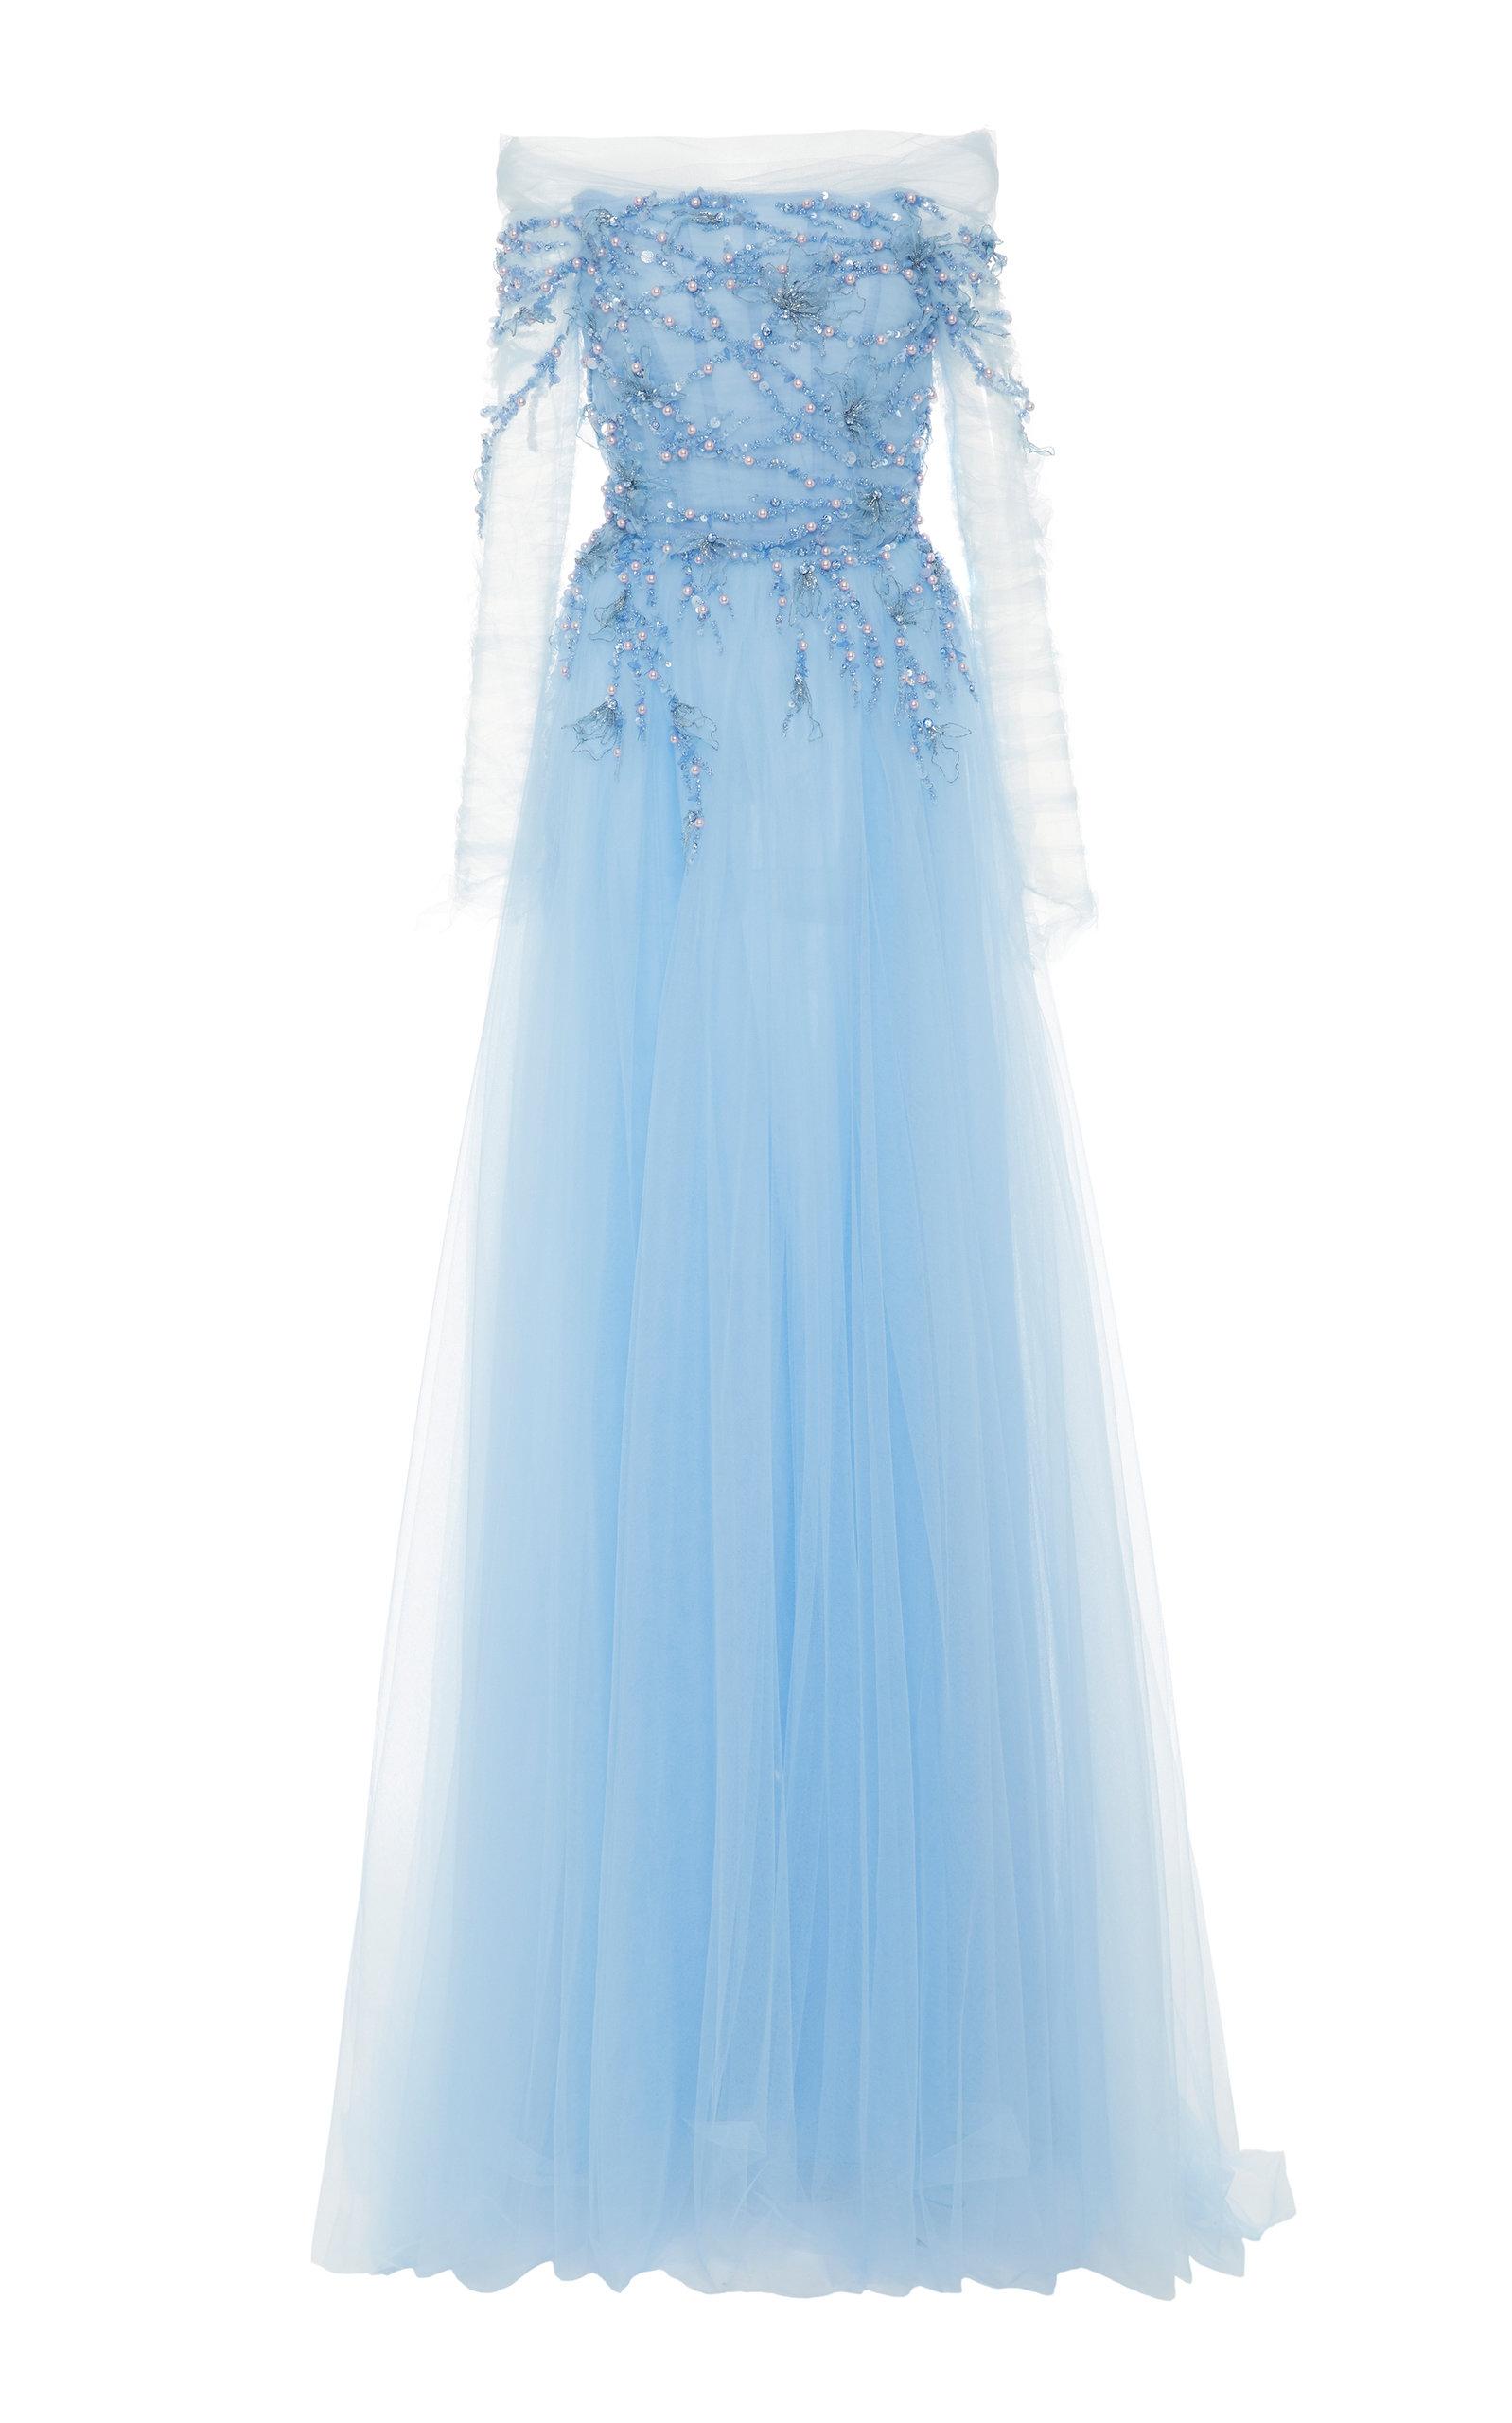 Buy Pamella Roland Cold-Shoulder Sequin-Embroidered Tulle Dress online, shop Pamella Roland at the best price